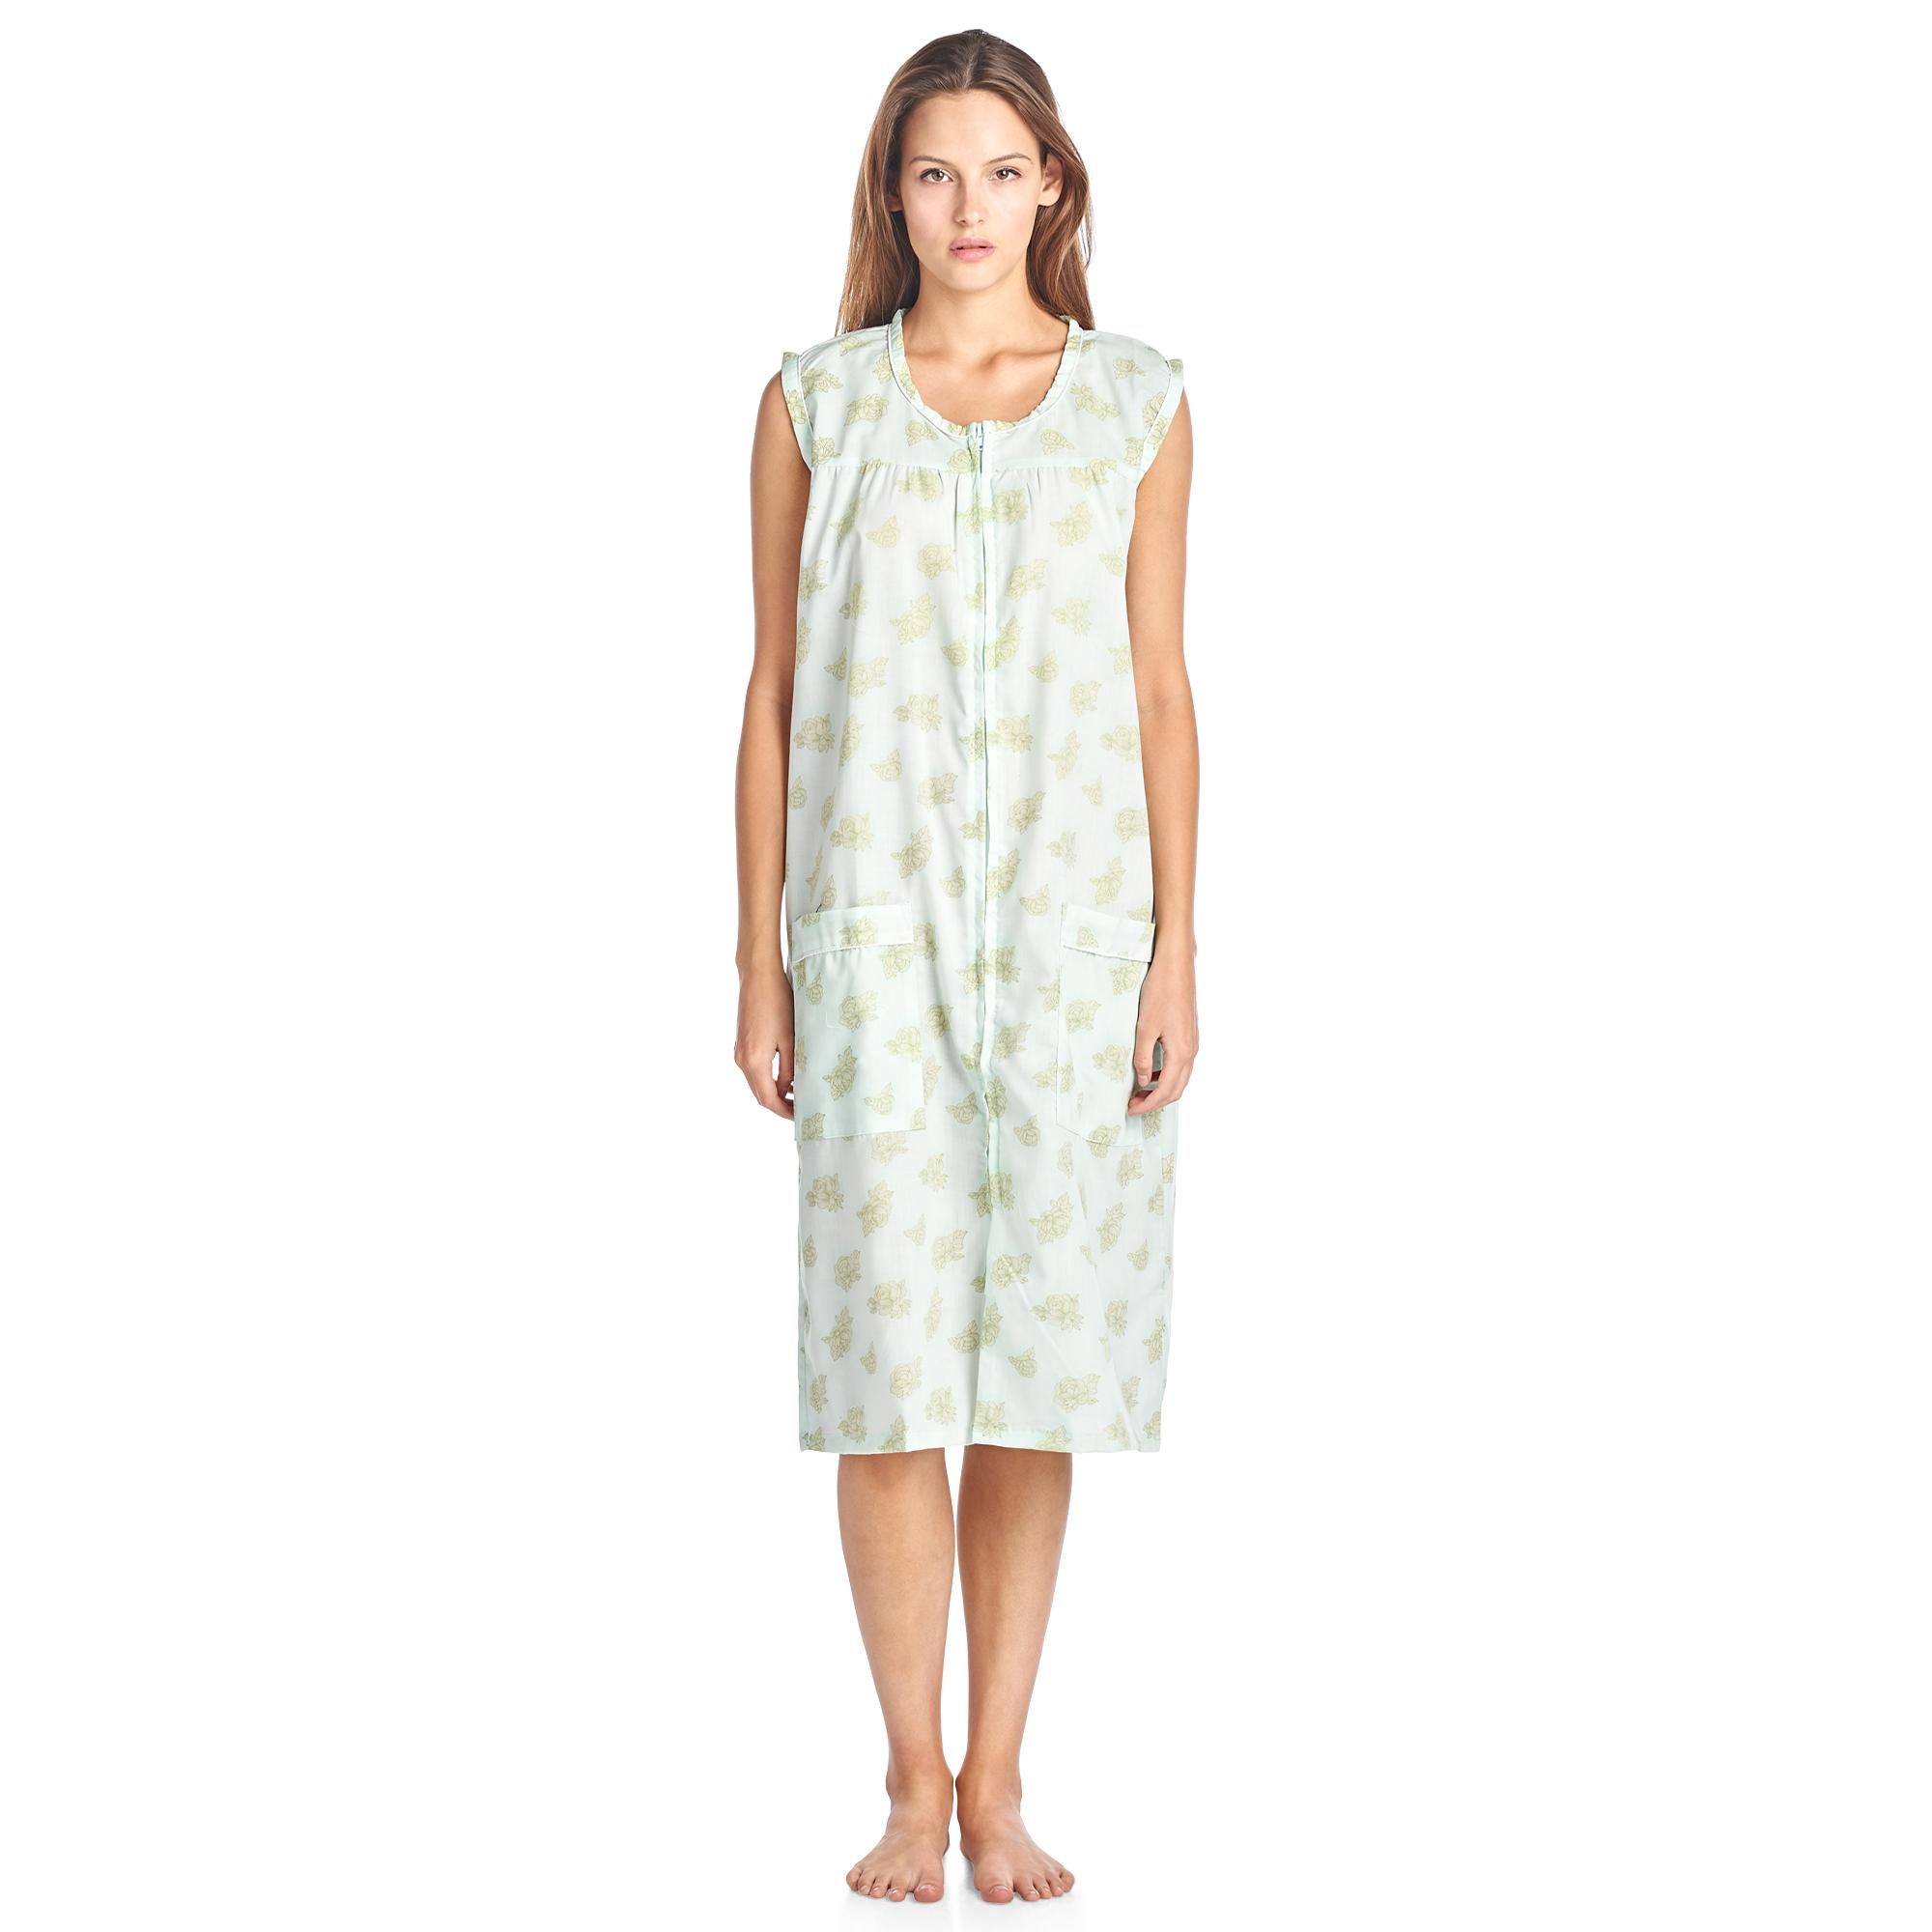 Casual Nights Women's Zip Up Sleeveless Duster Robe - Mint